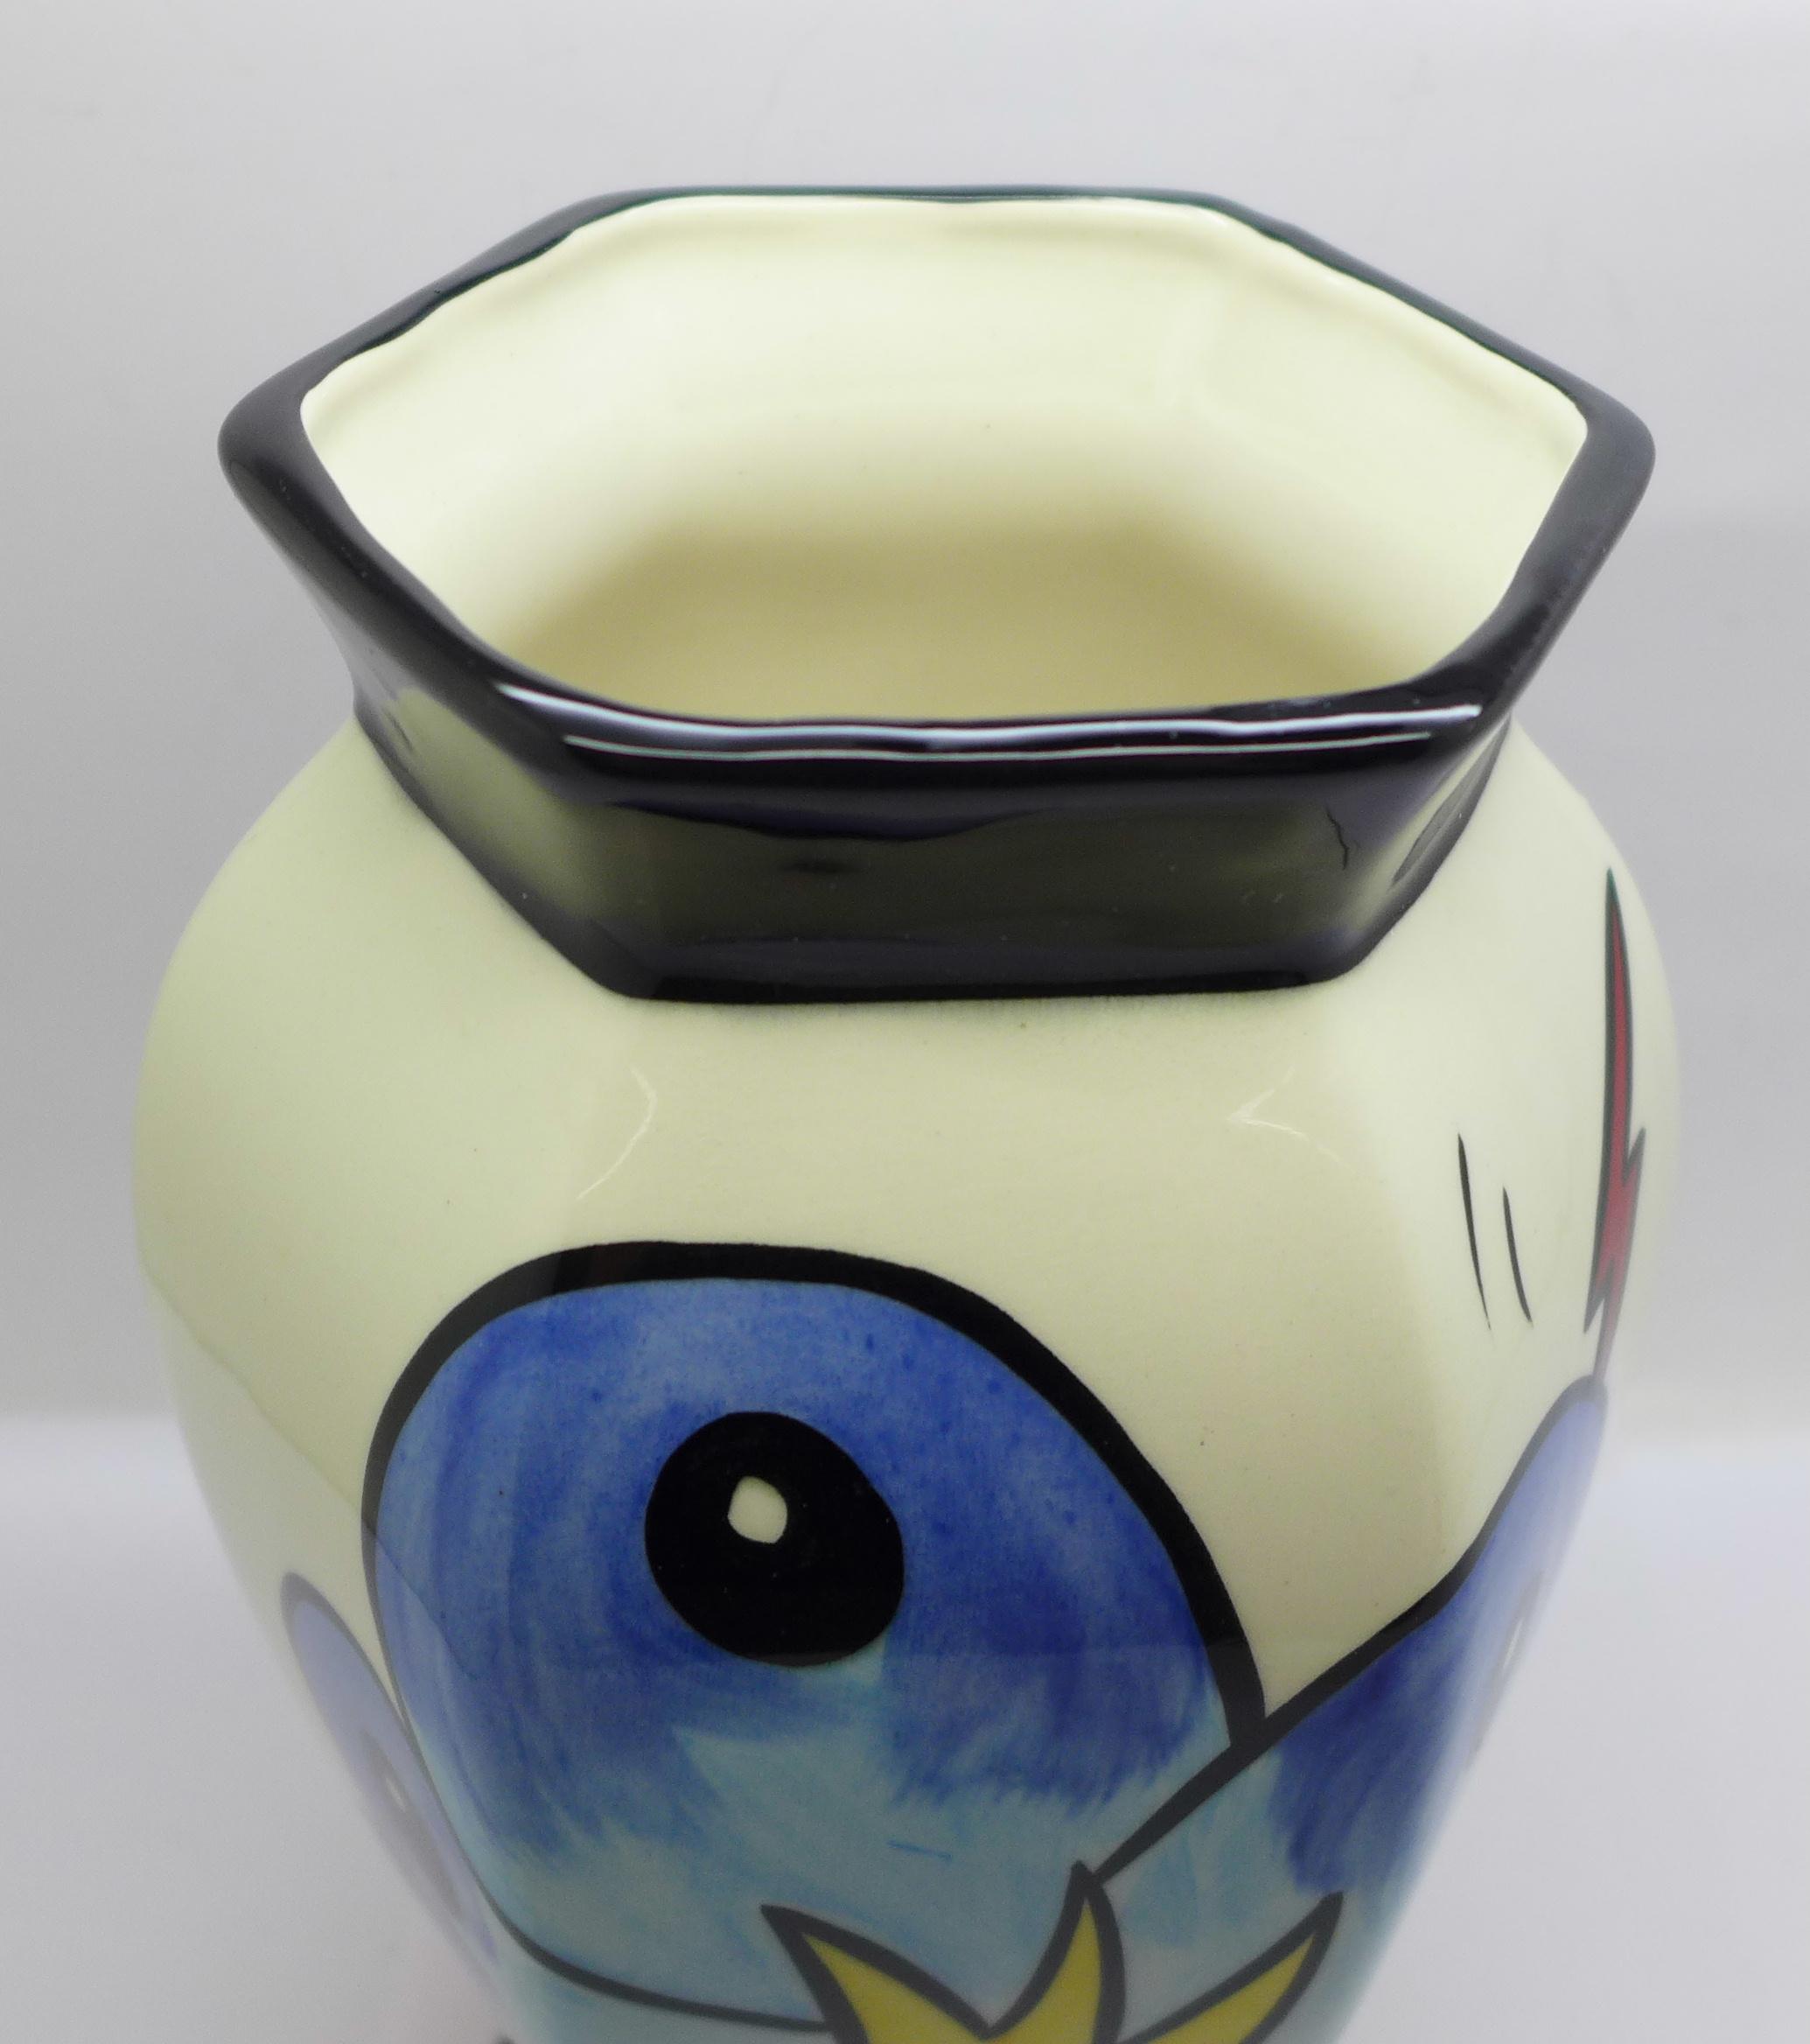 Lorna Bailey Pottery, hexagonal vase in the 'Bursley Way' design, 'Lorna Bailey' signature on the - Image 4 of 5